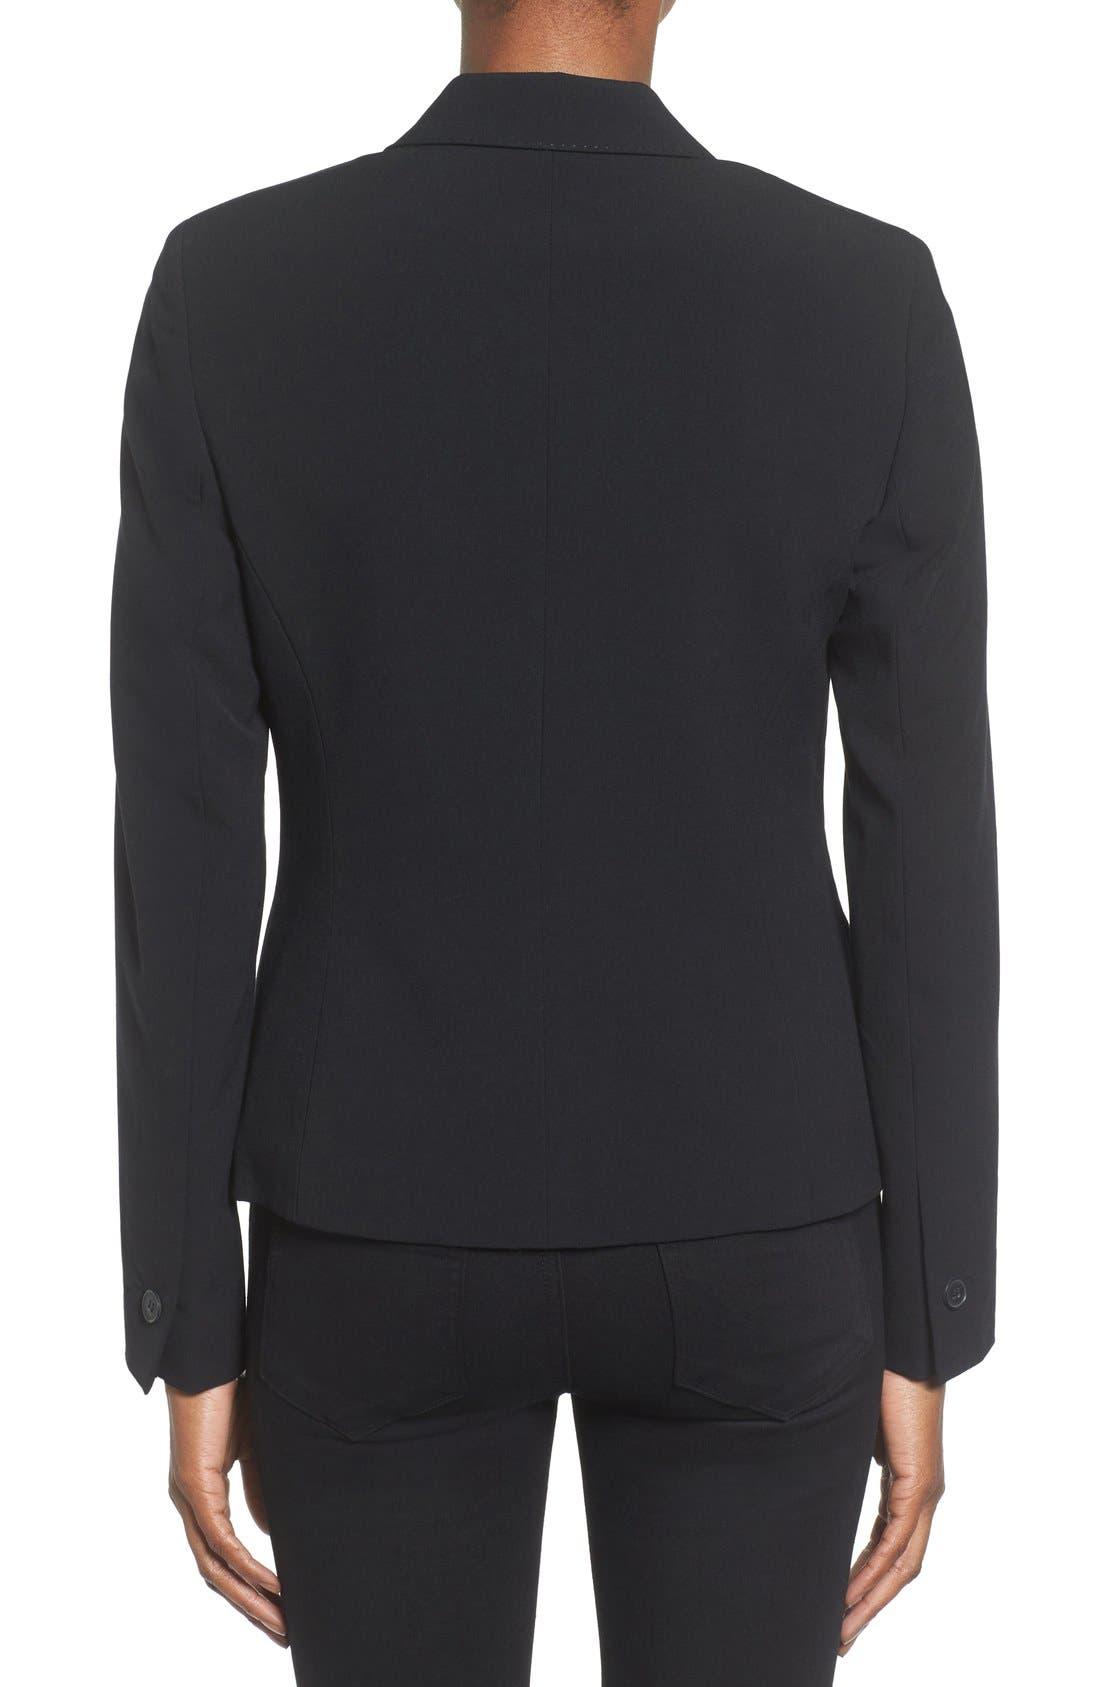 ANNE KLEIN, One-Button Suit Jacket, Alternate thumbnail 2, color, ANNE KLEIN BLACK